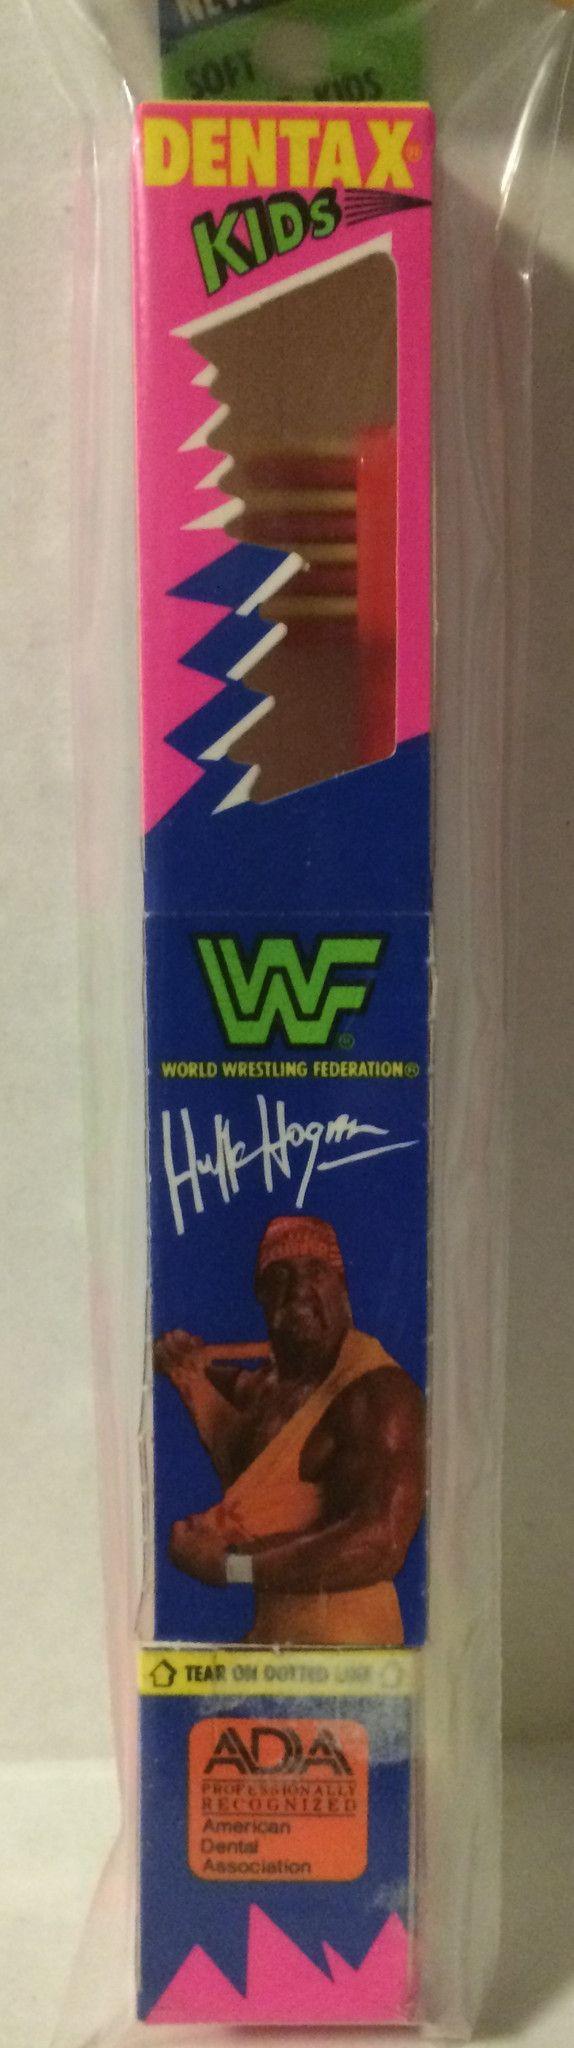 (GBS04713) WWF WWE WCW nWo Wrestling Dentax Kids Toothbrush - Hulk Hogan